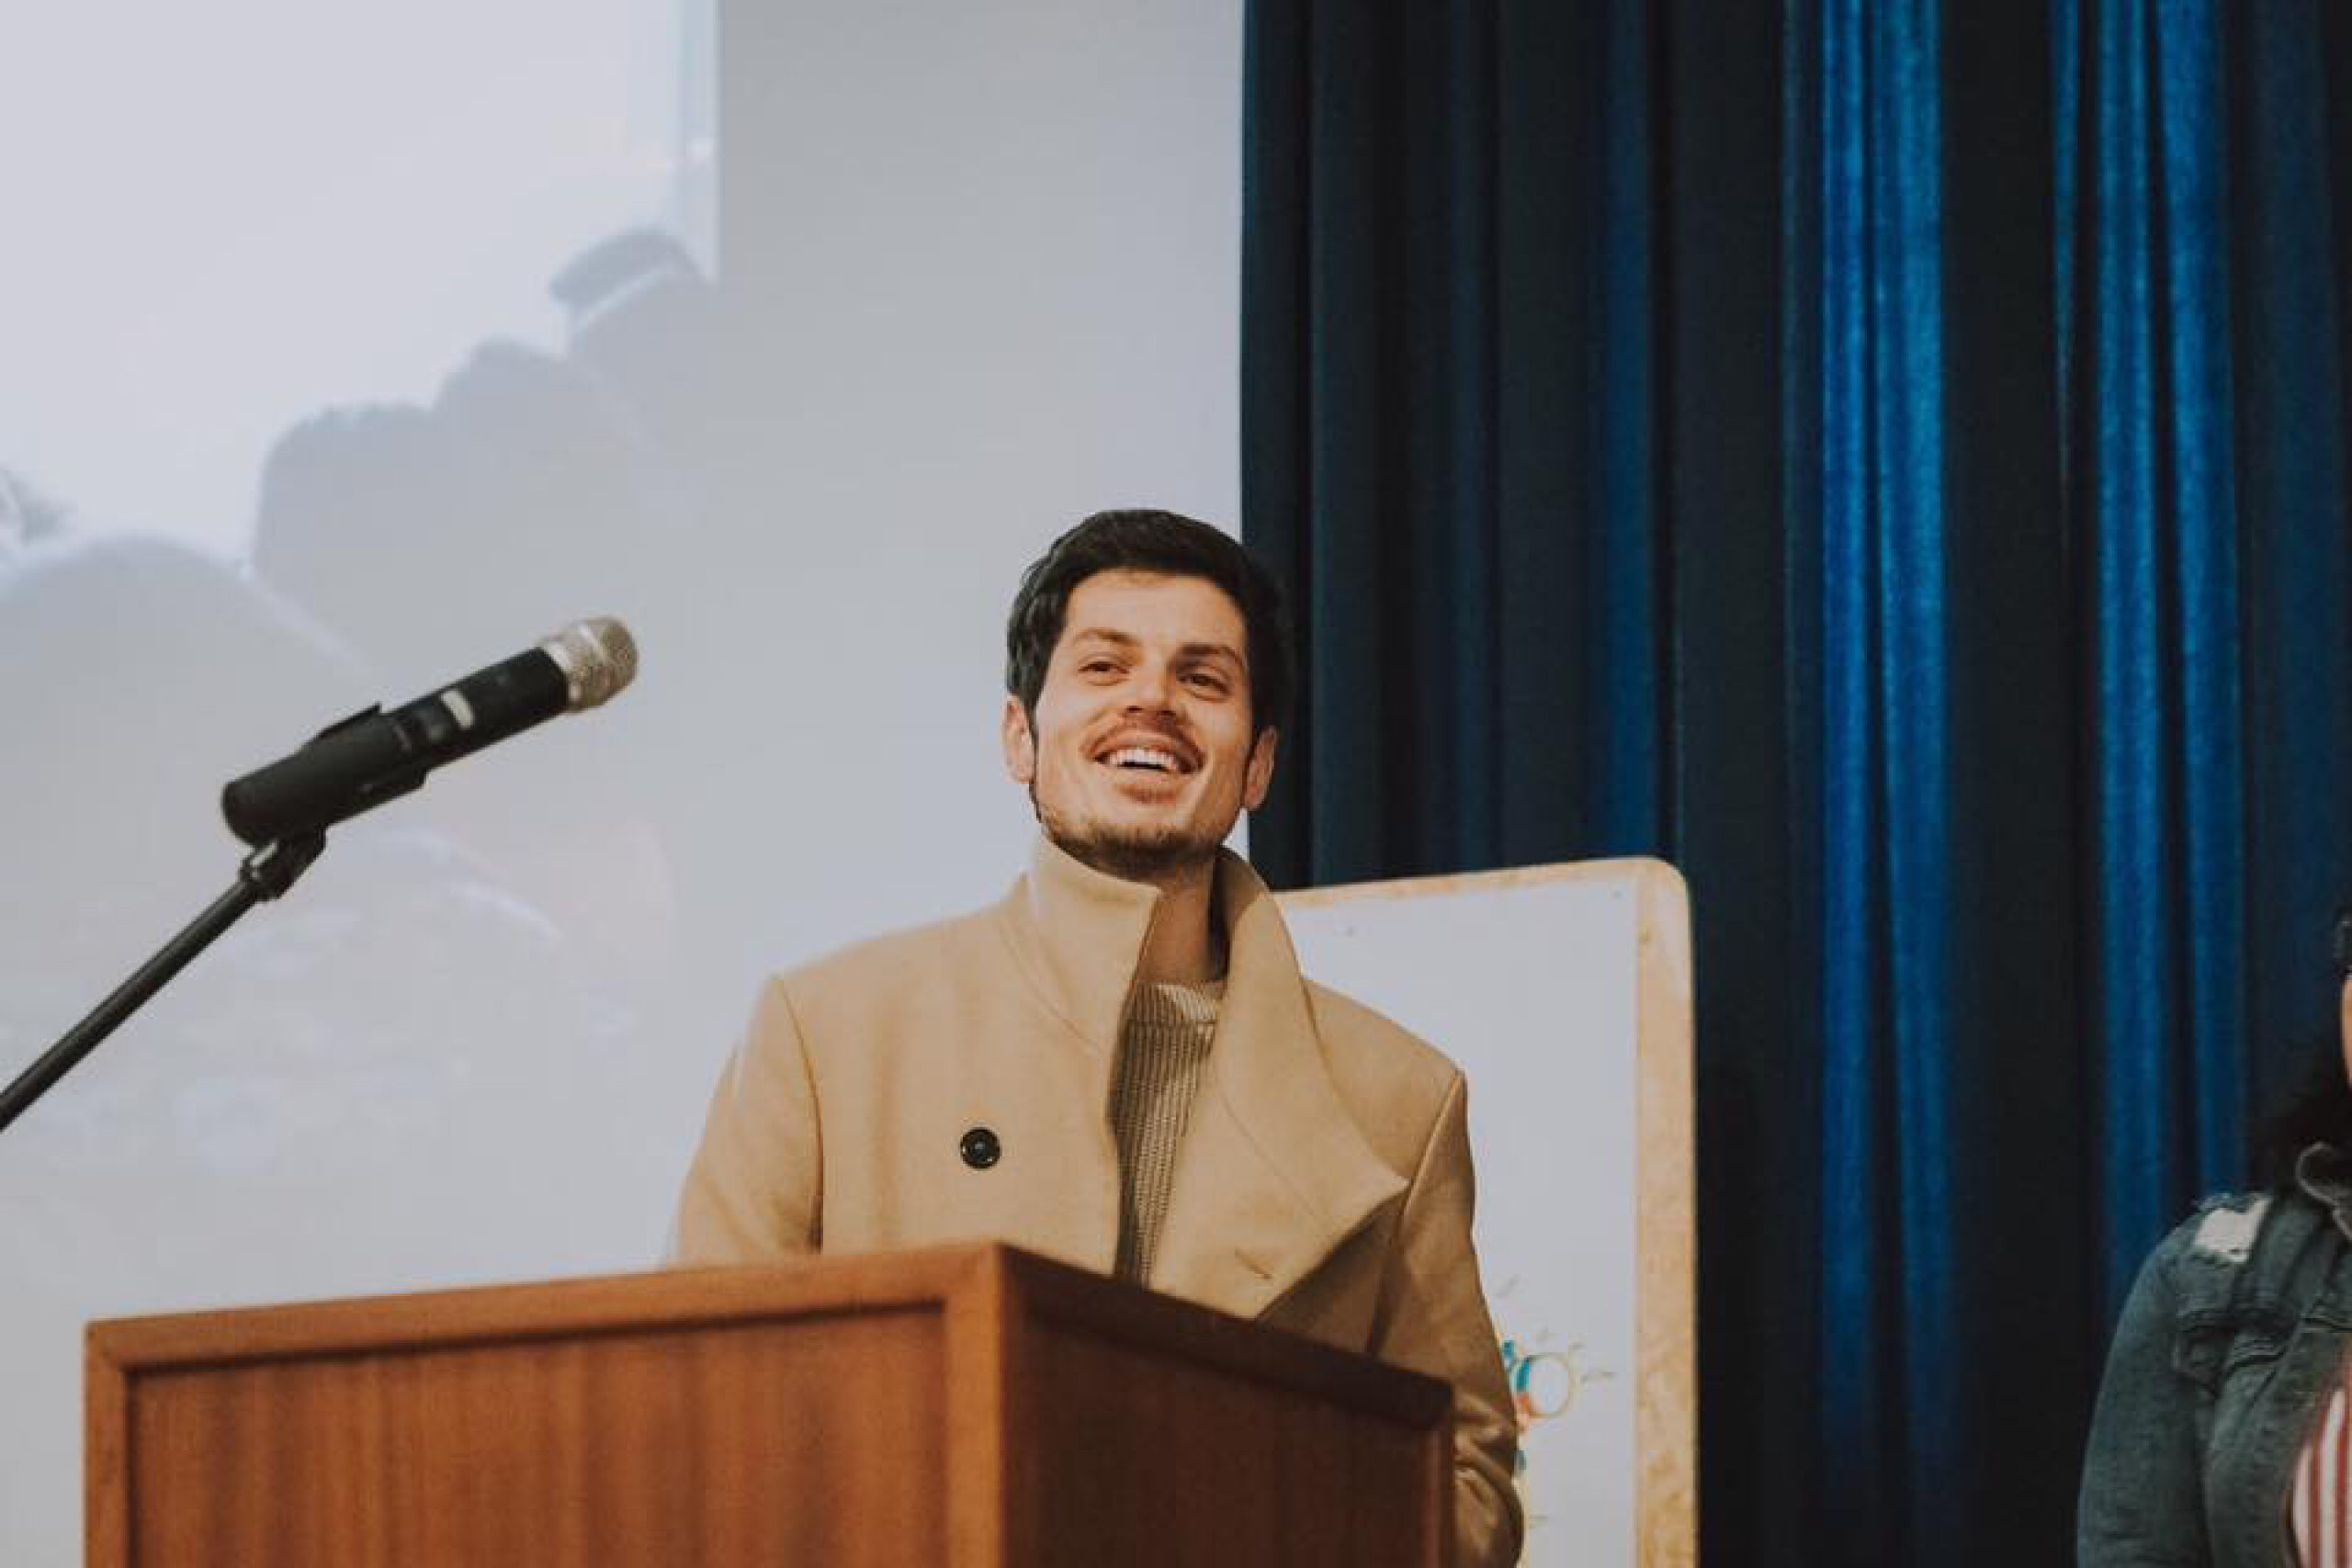 gerador-award-speech@3x